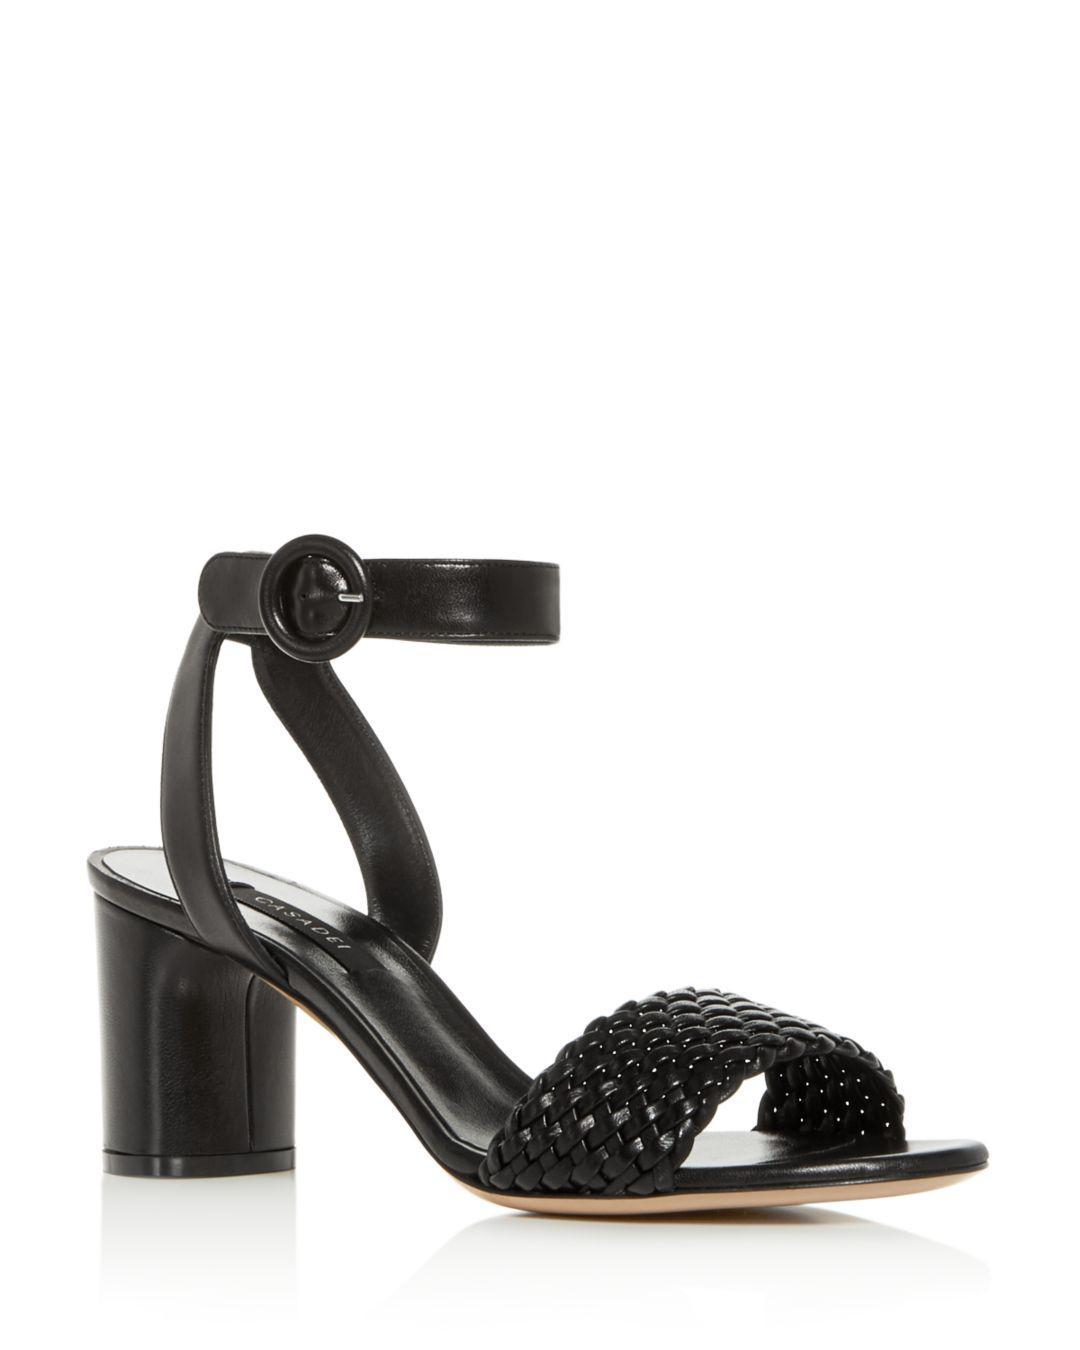 585f4be39a29 Lyst - Casadei Women s Woven Ankle-strap Block-heel Sandals in Black